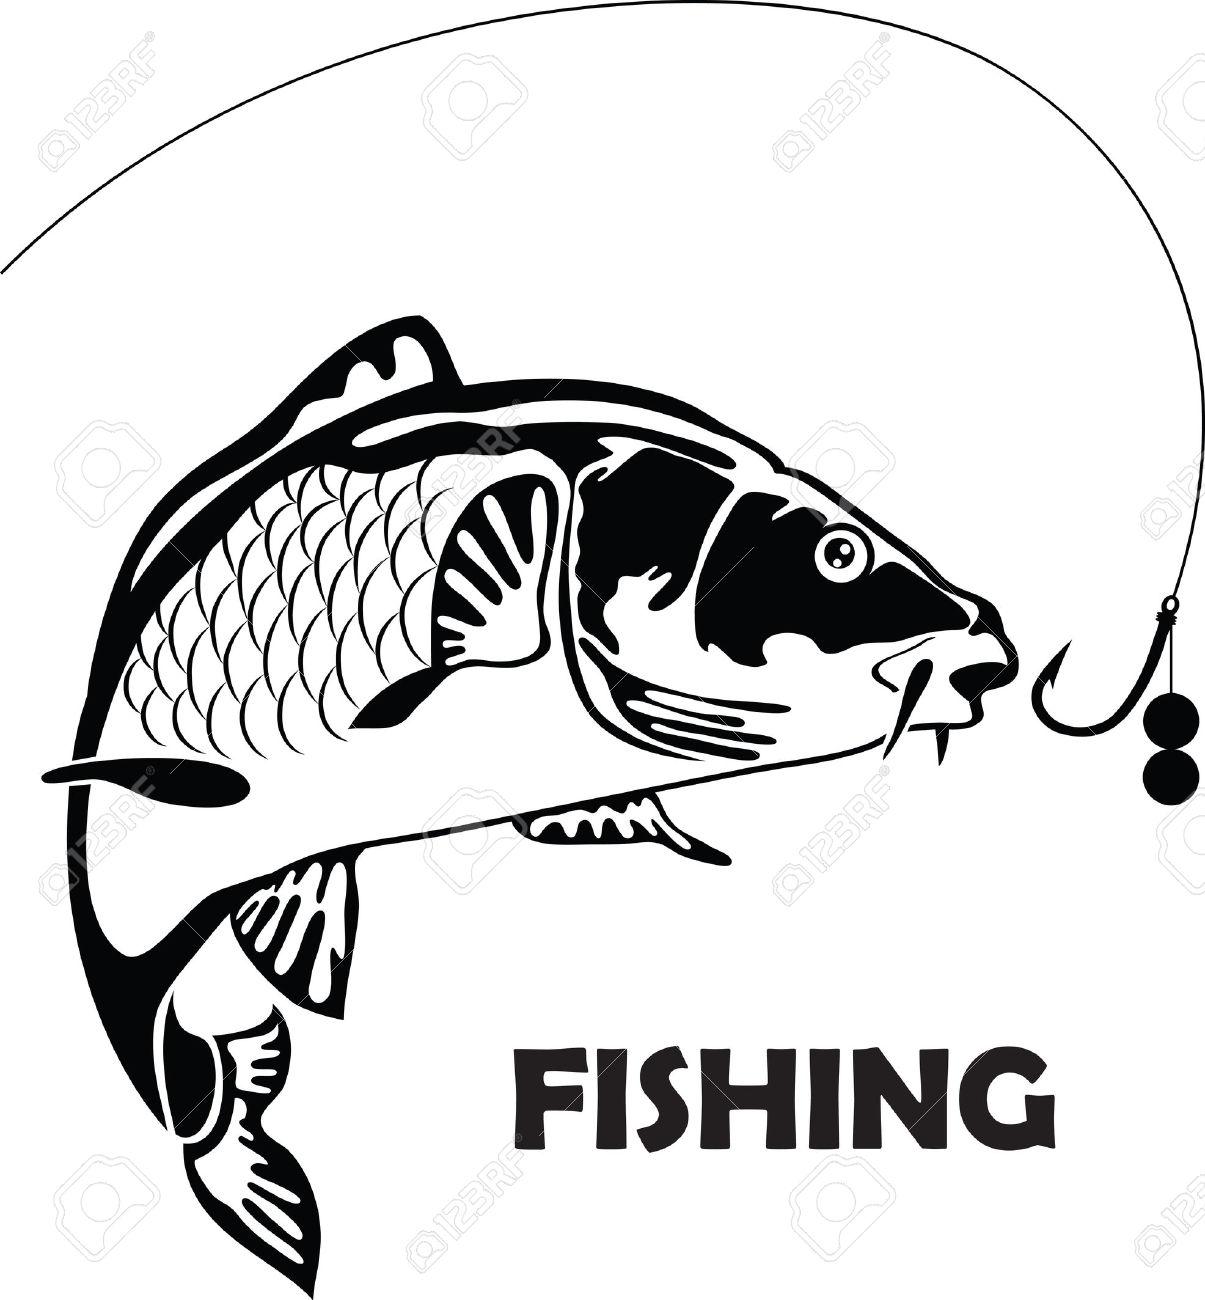 1205x1300 Carp Fish Clipart, Explore Pictures